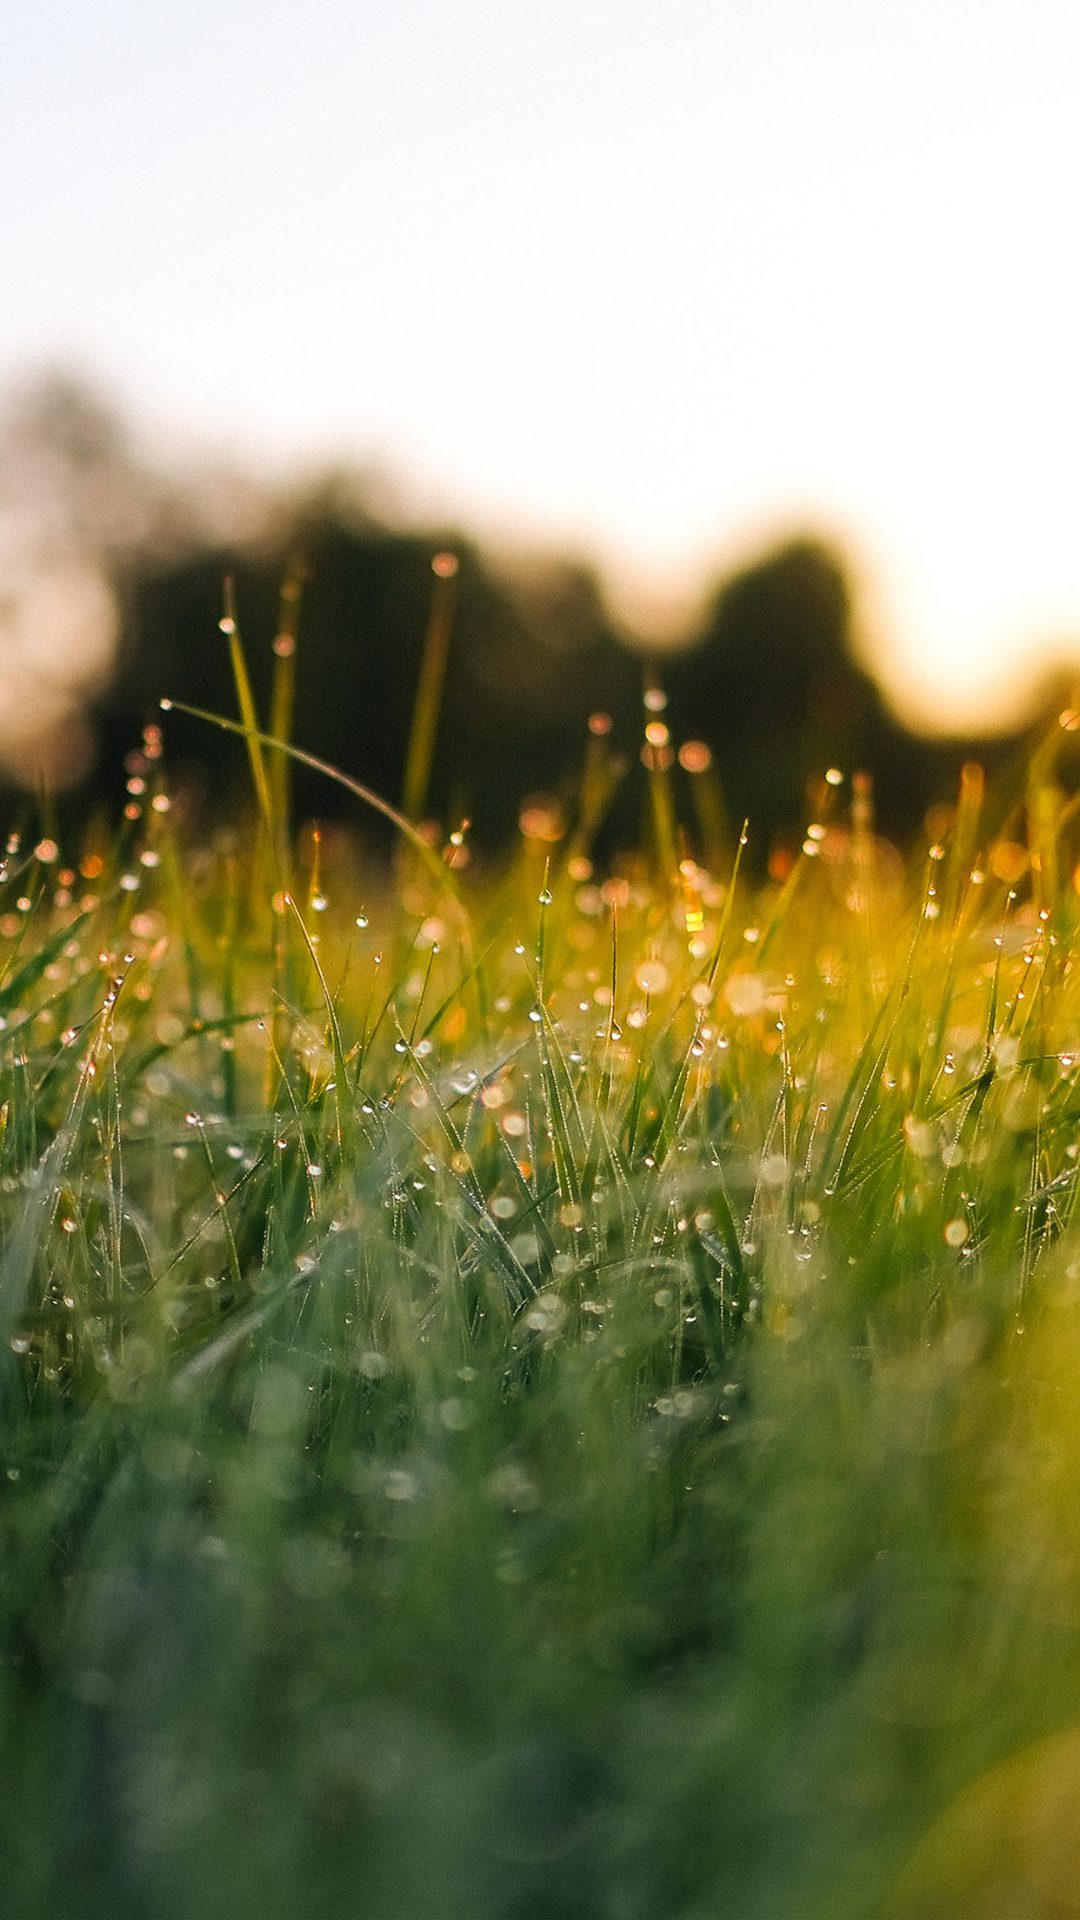 Lawn Green Nature Sunset Light Bokeh Sprin